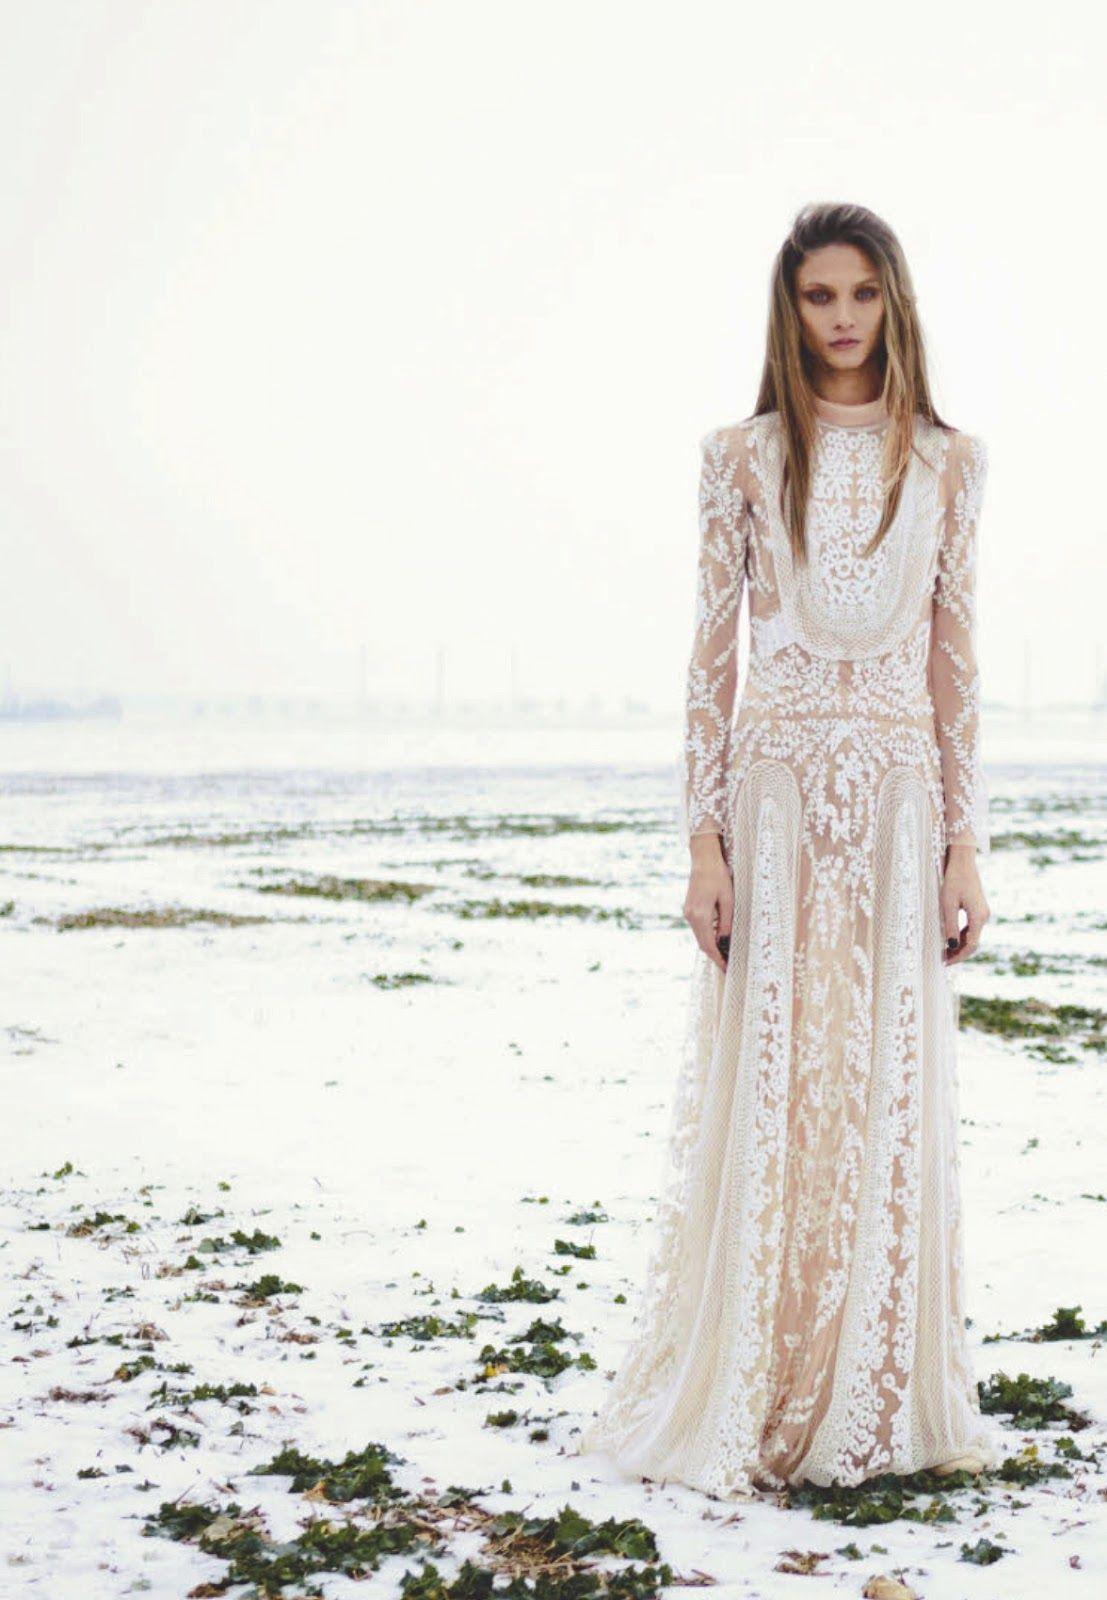 Winter Solstice I Would Wear Fashion Wedding Dresses Anna